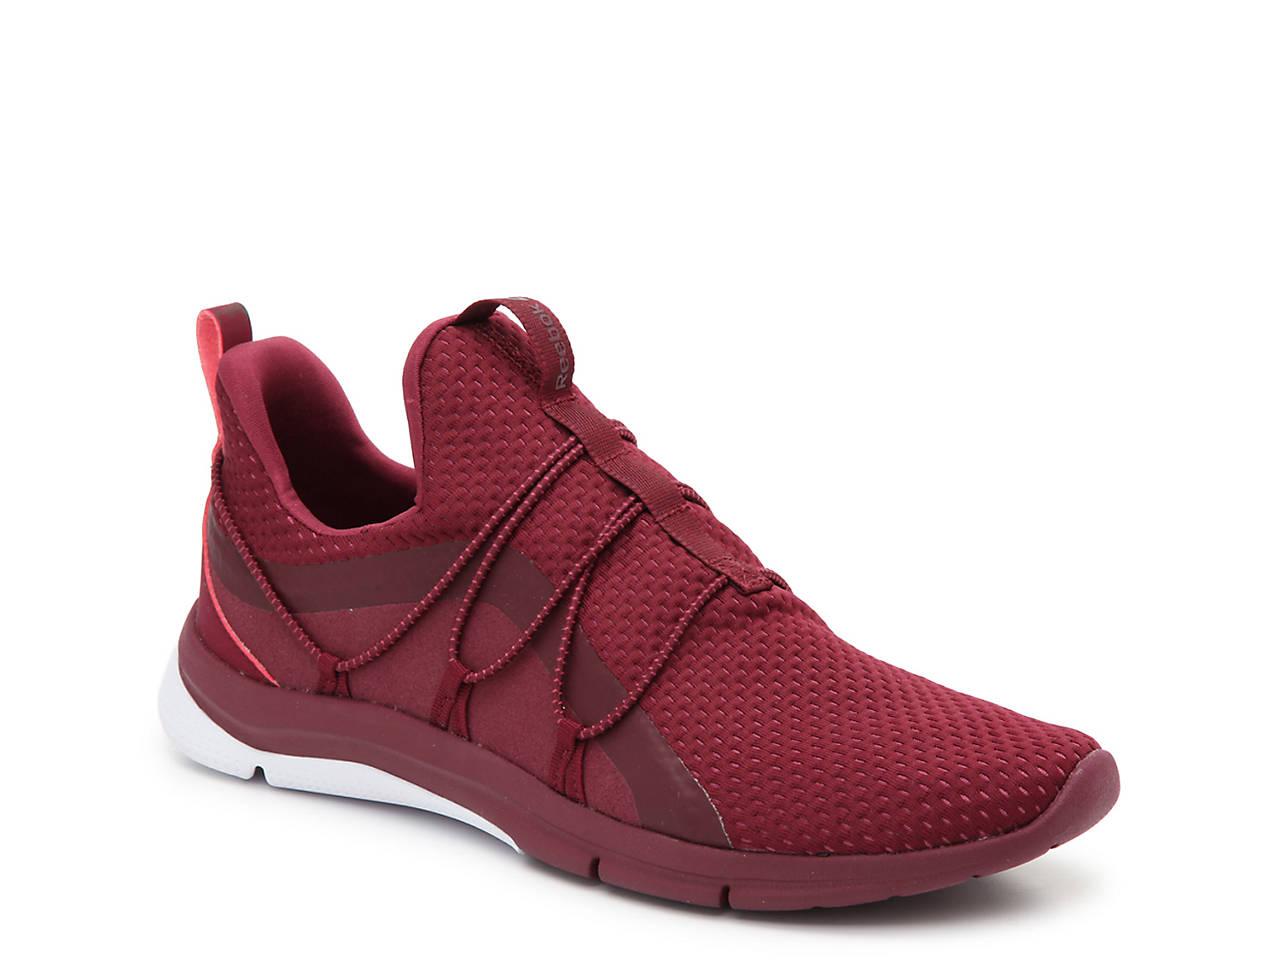 3228c4095582ad Reebok Print HER 3.0 Lightweight Slip-On Running Shoe - Women s ...